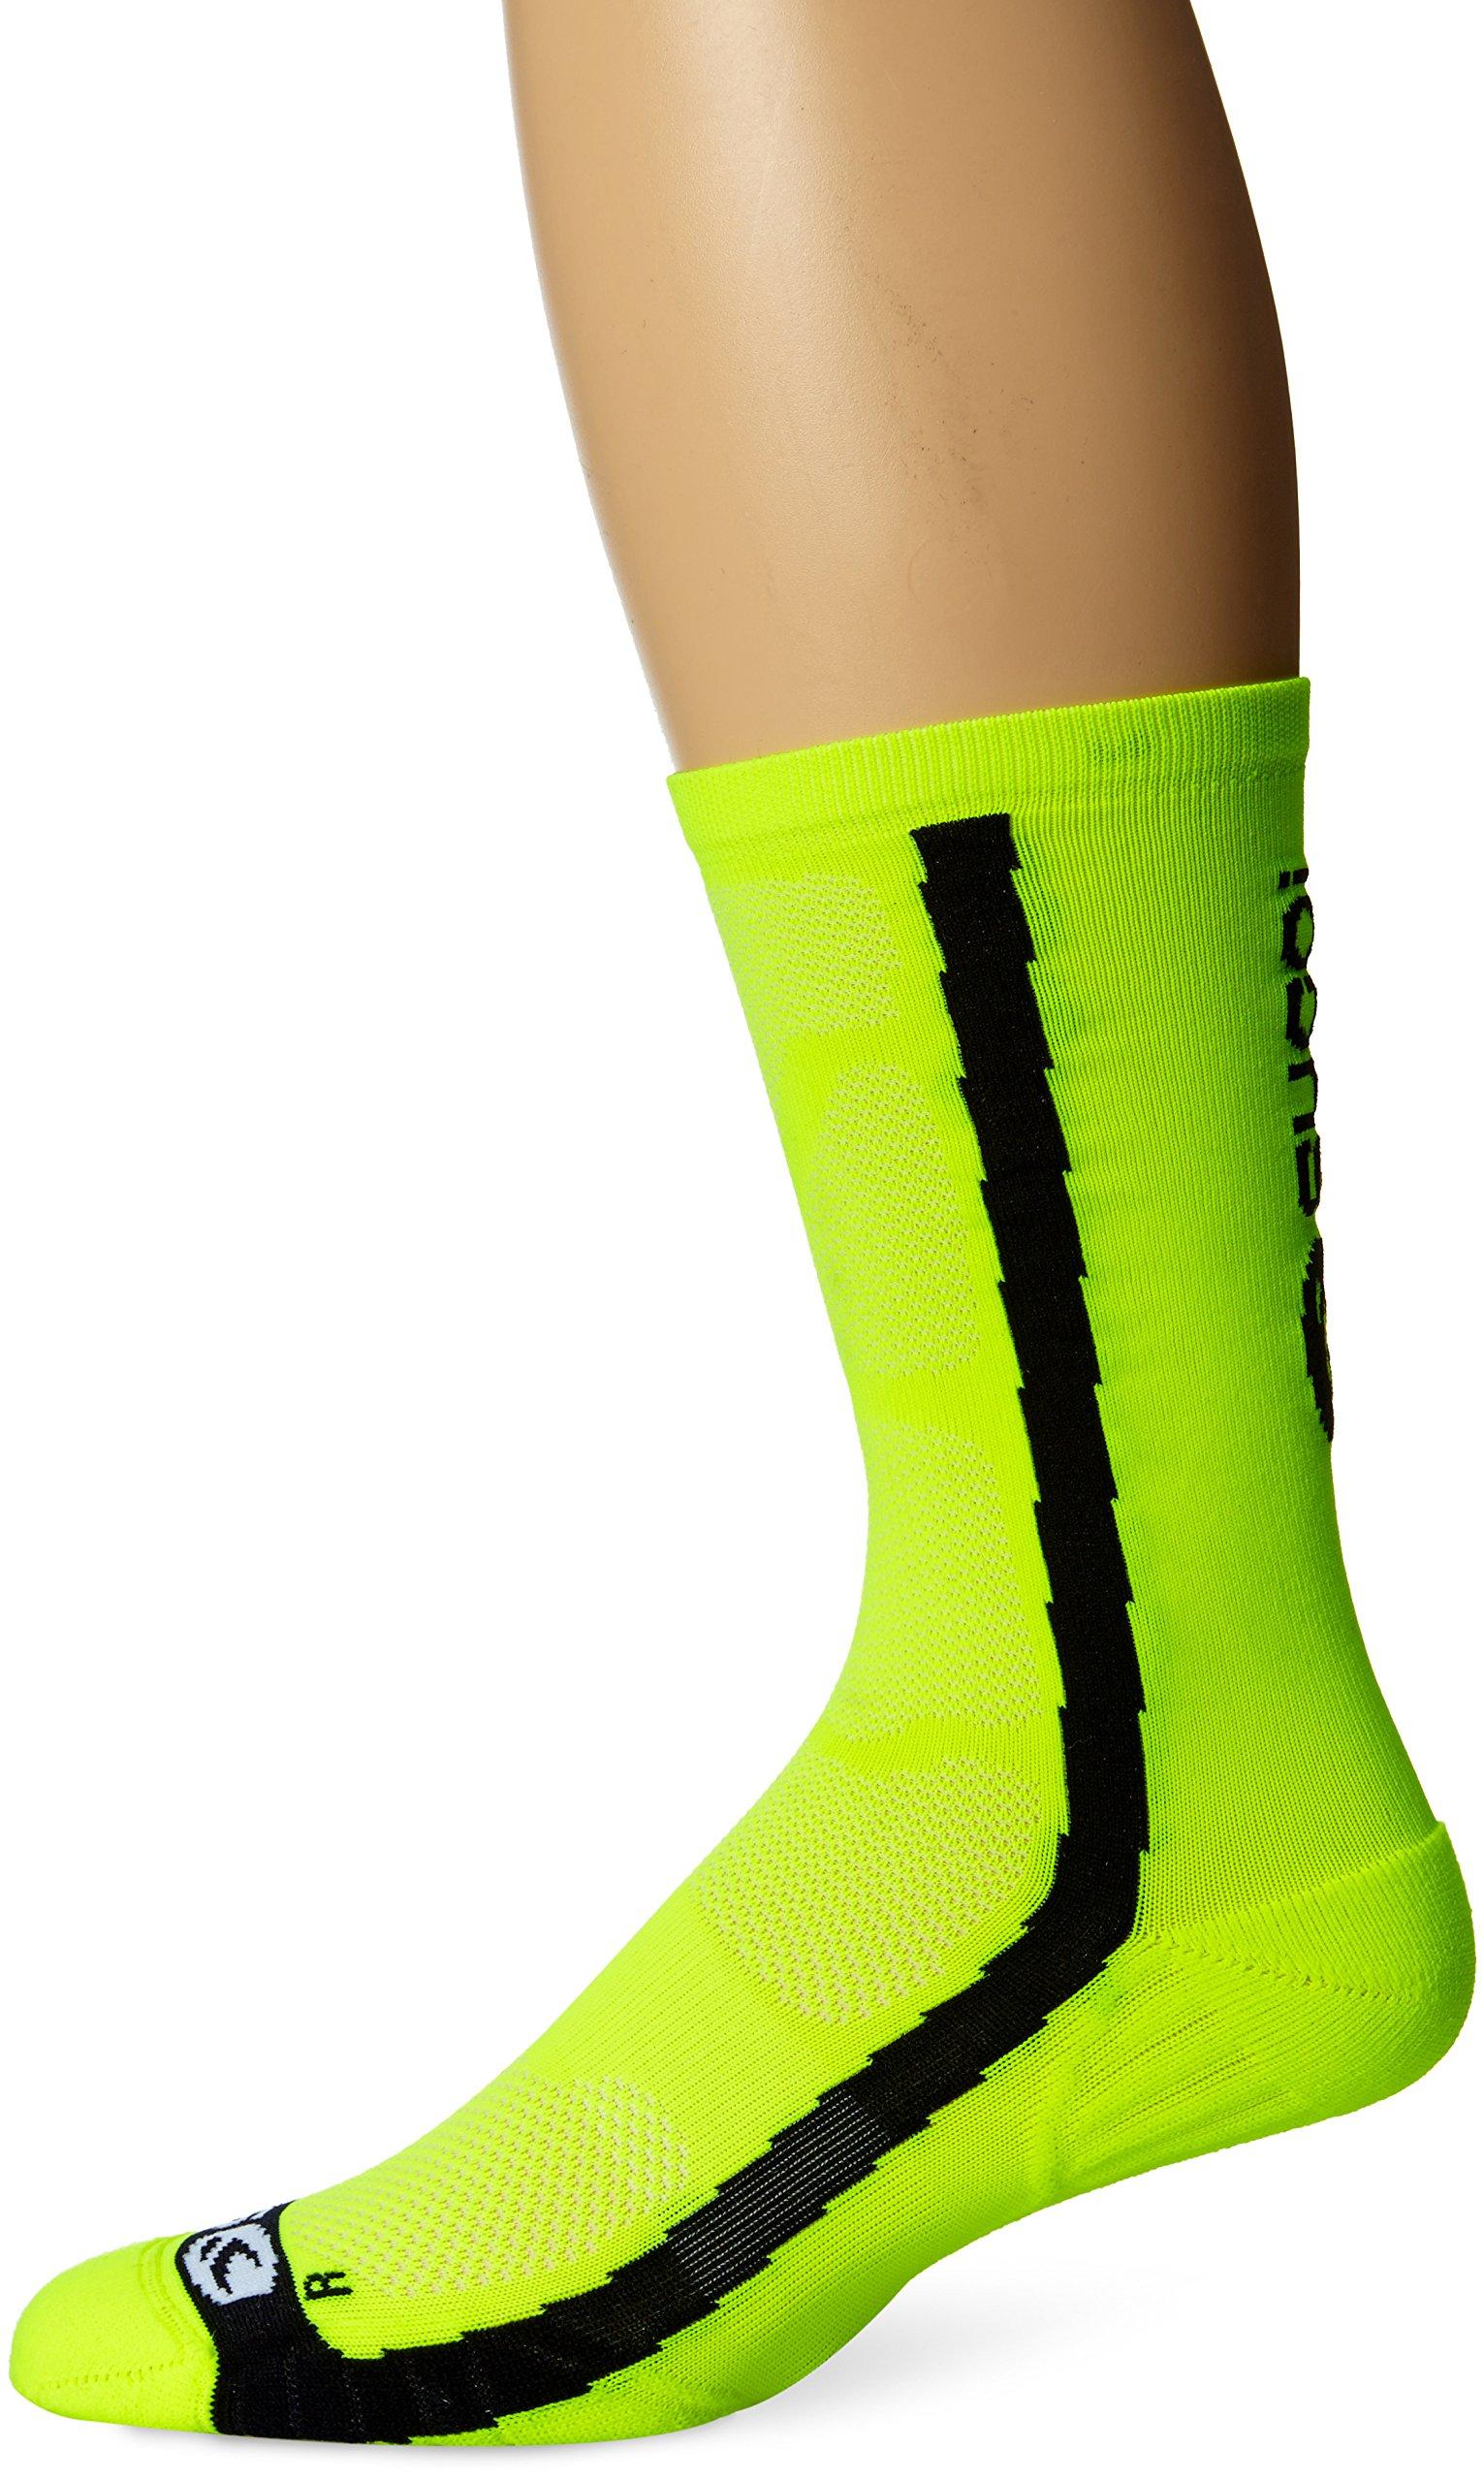 Sugoi Men's RS Crew Socks, Super Nova Yellow, Large by SUGOi